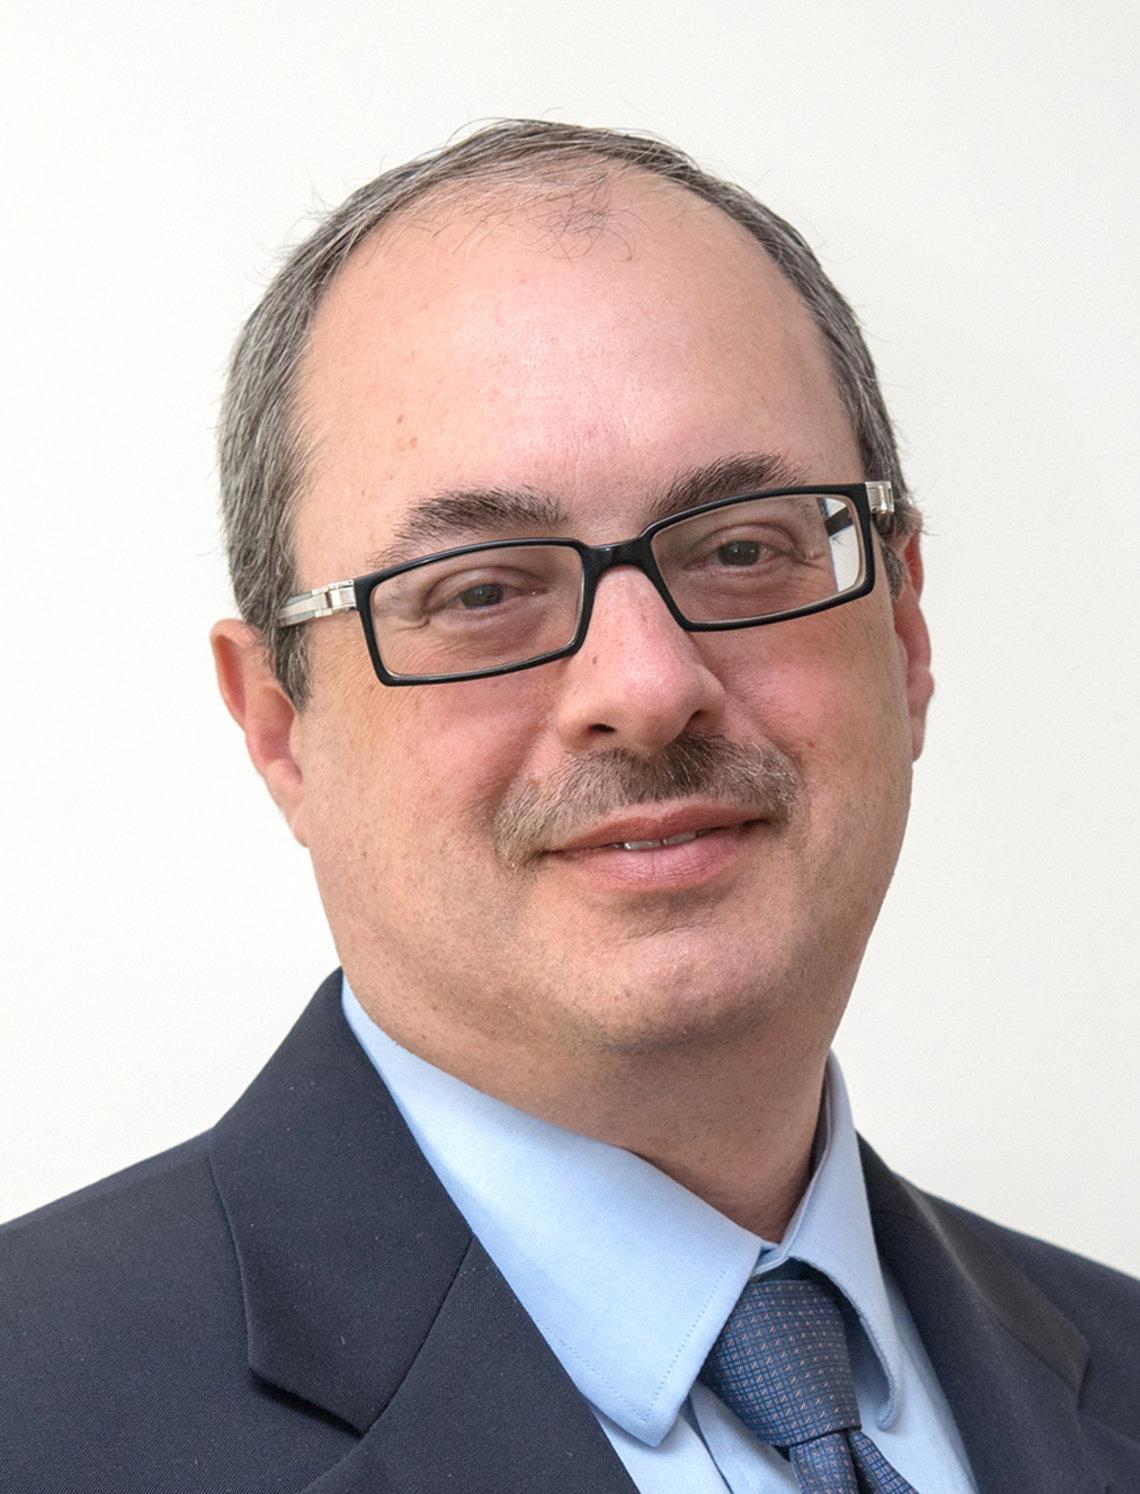 Alex Rosenthal of NIAID